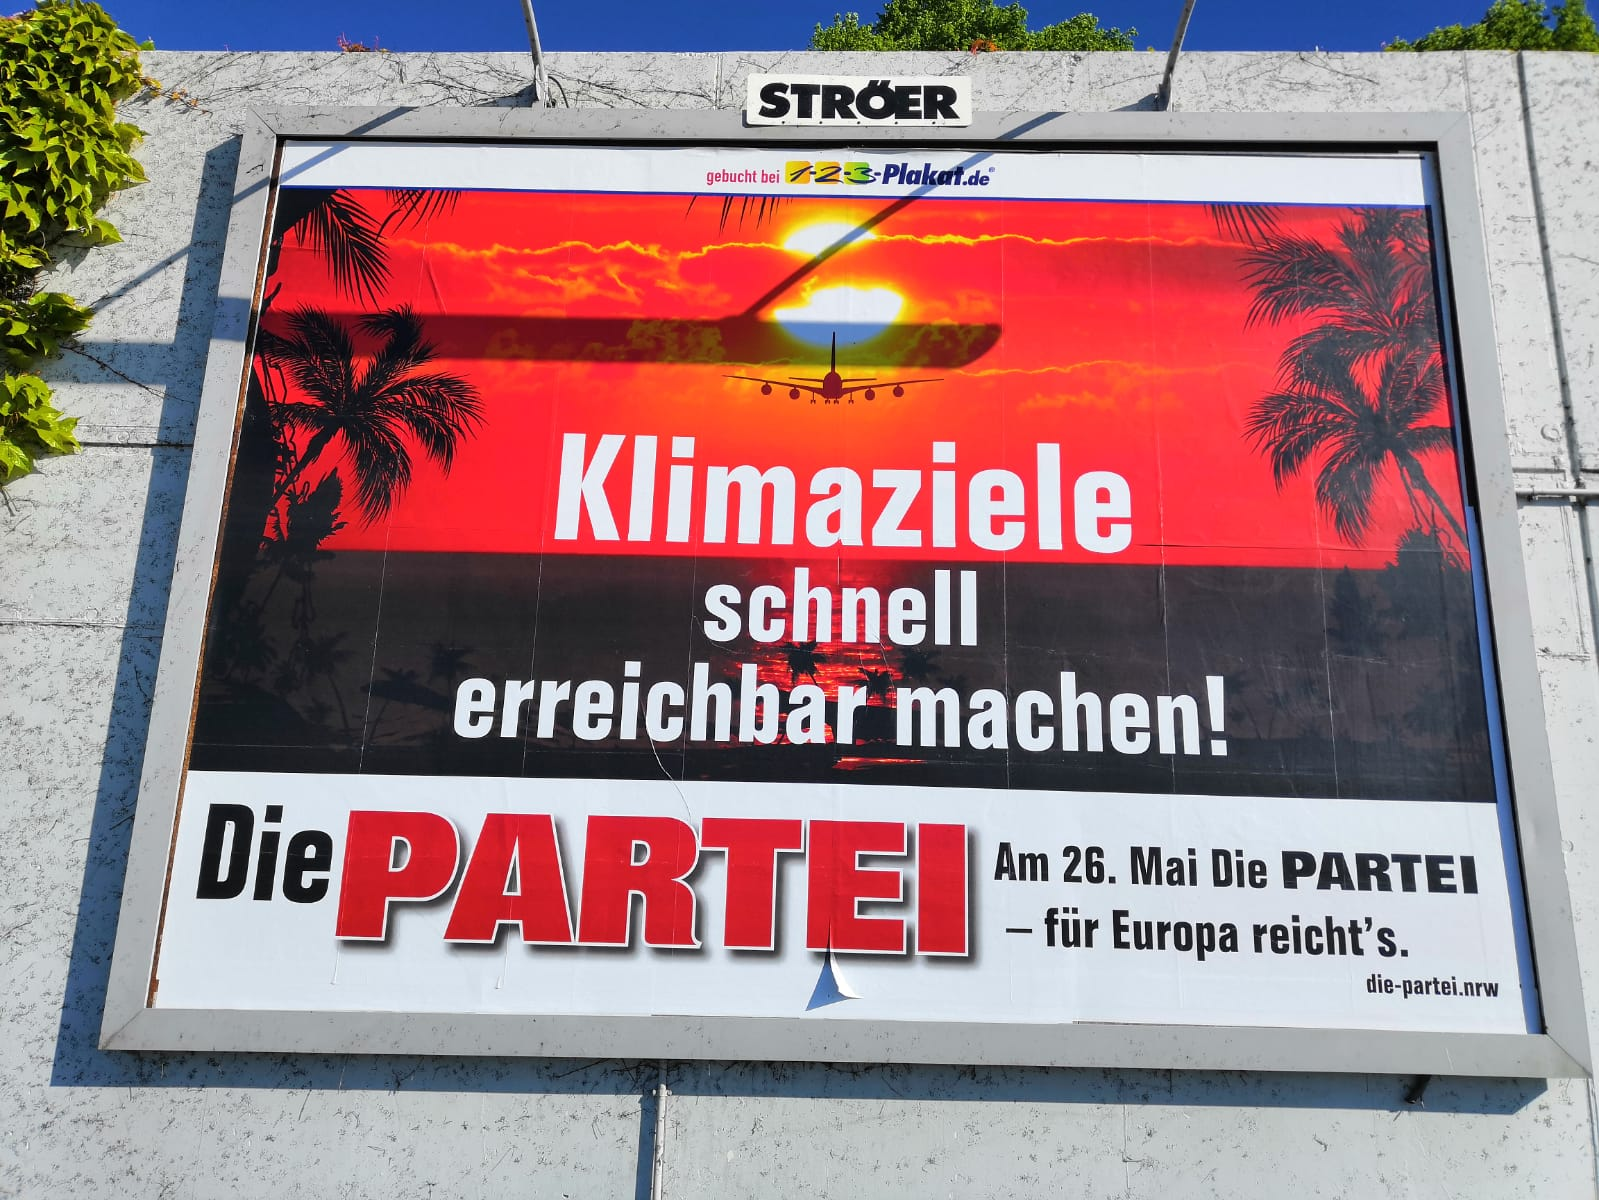 Großplakat in Dortmund